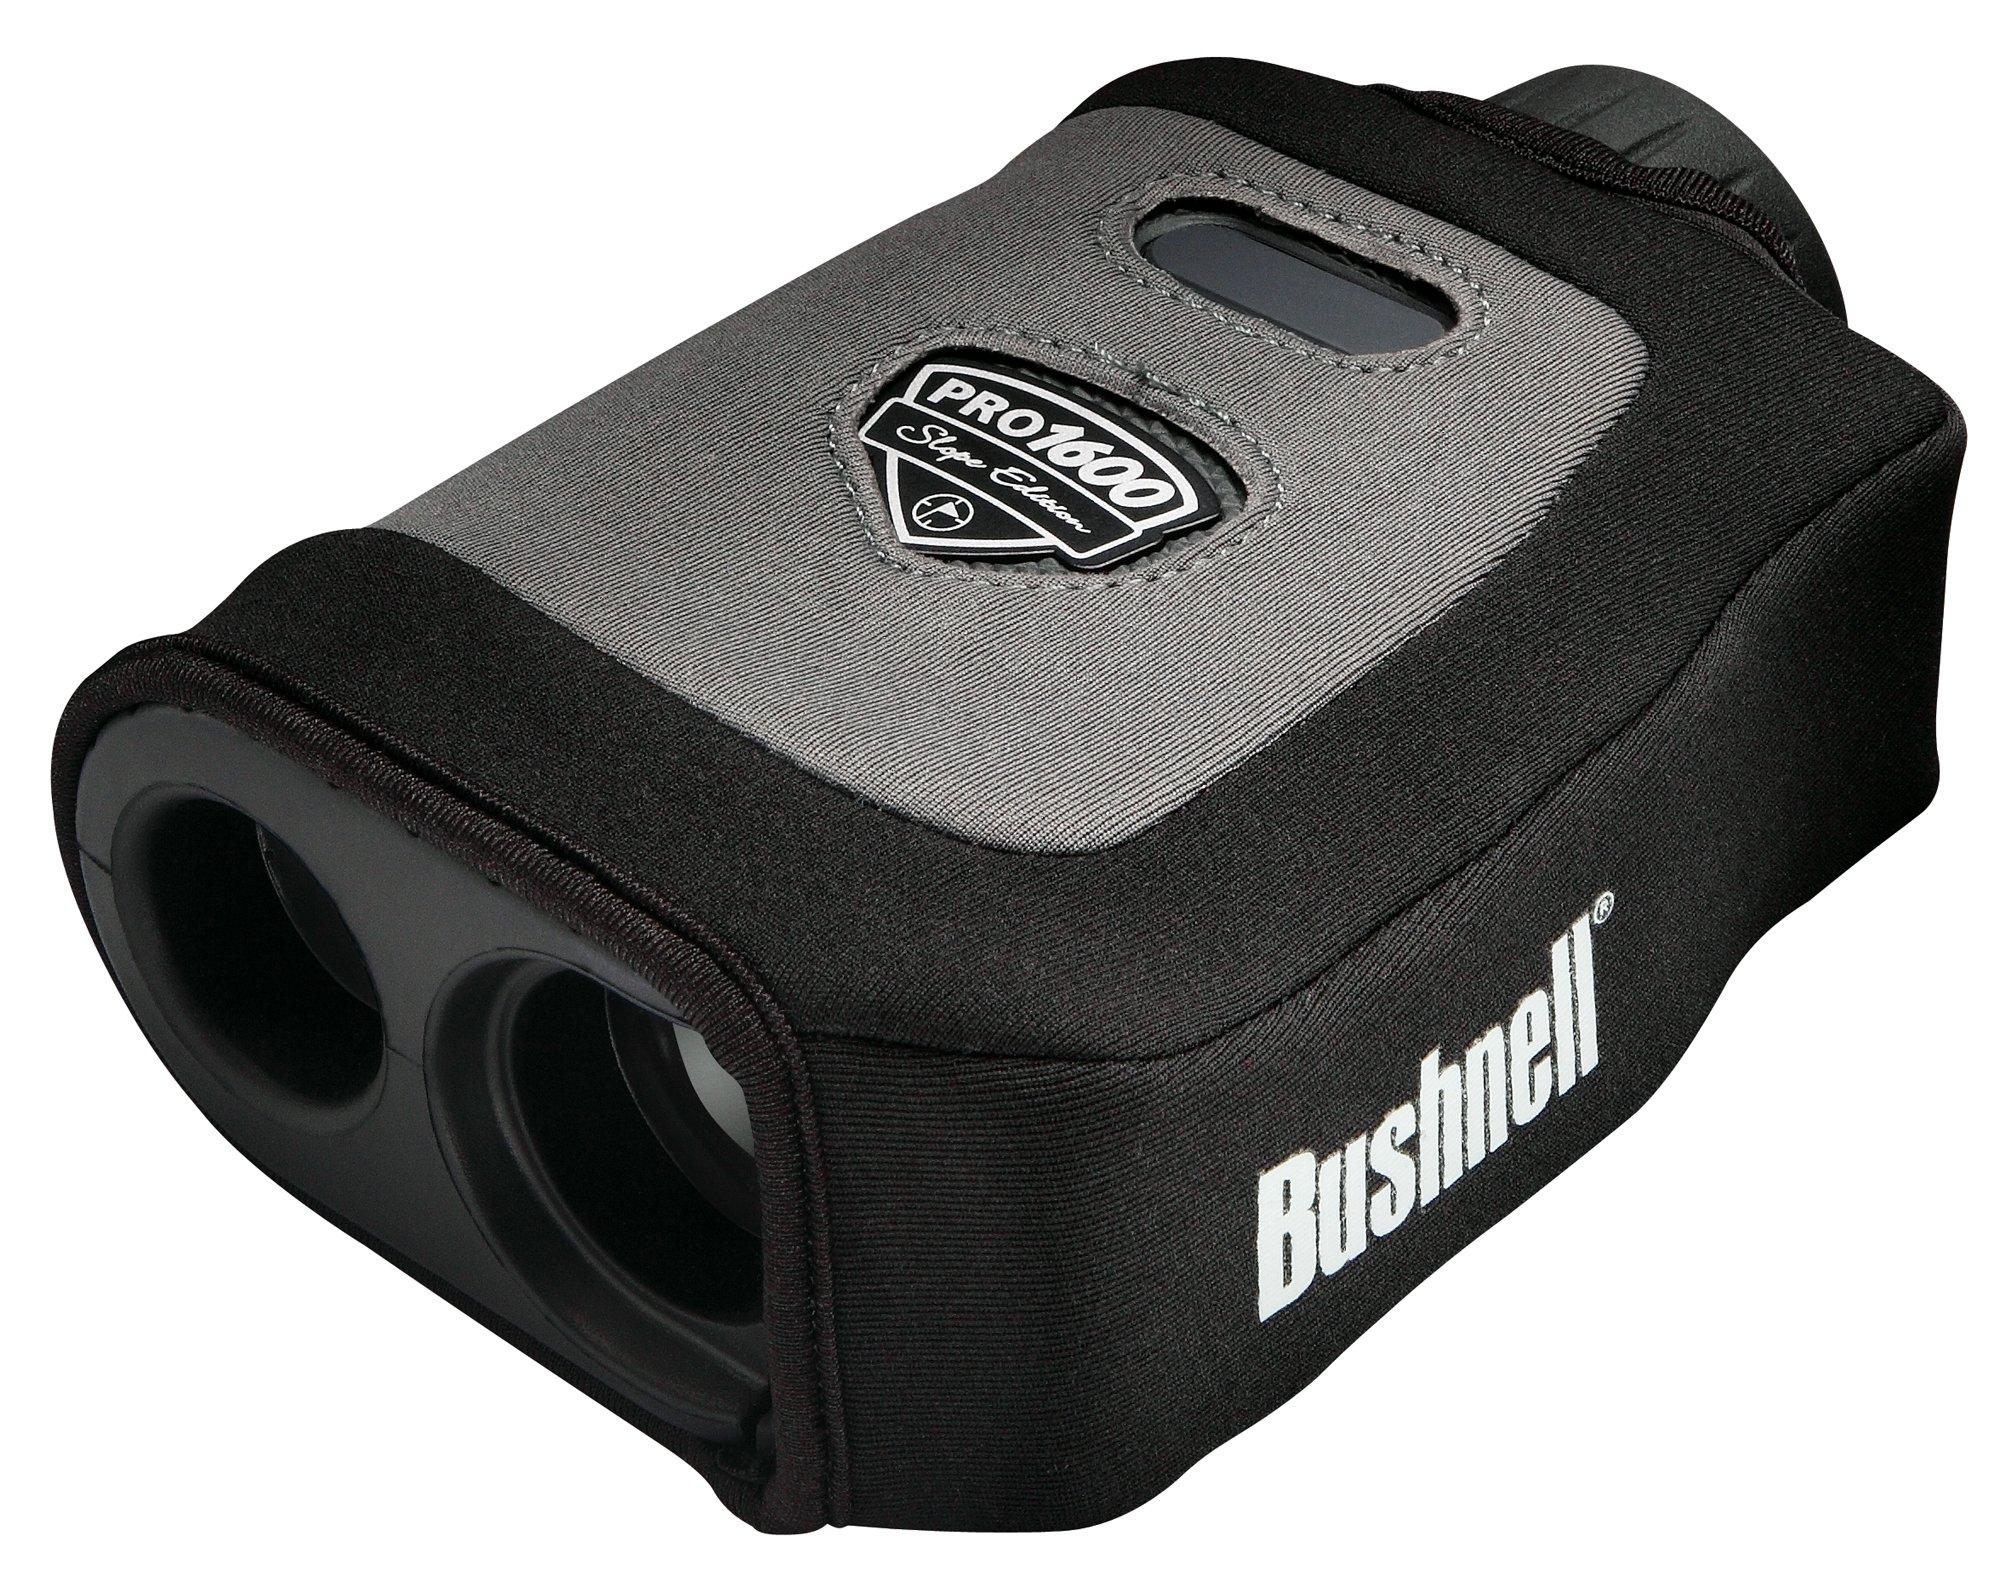 Bushnell 1600 Pro Neoprene Rangefinder Skin